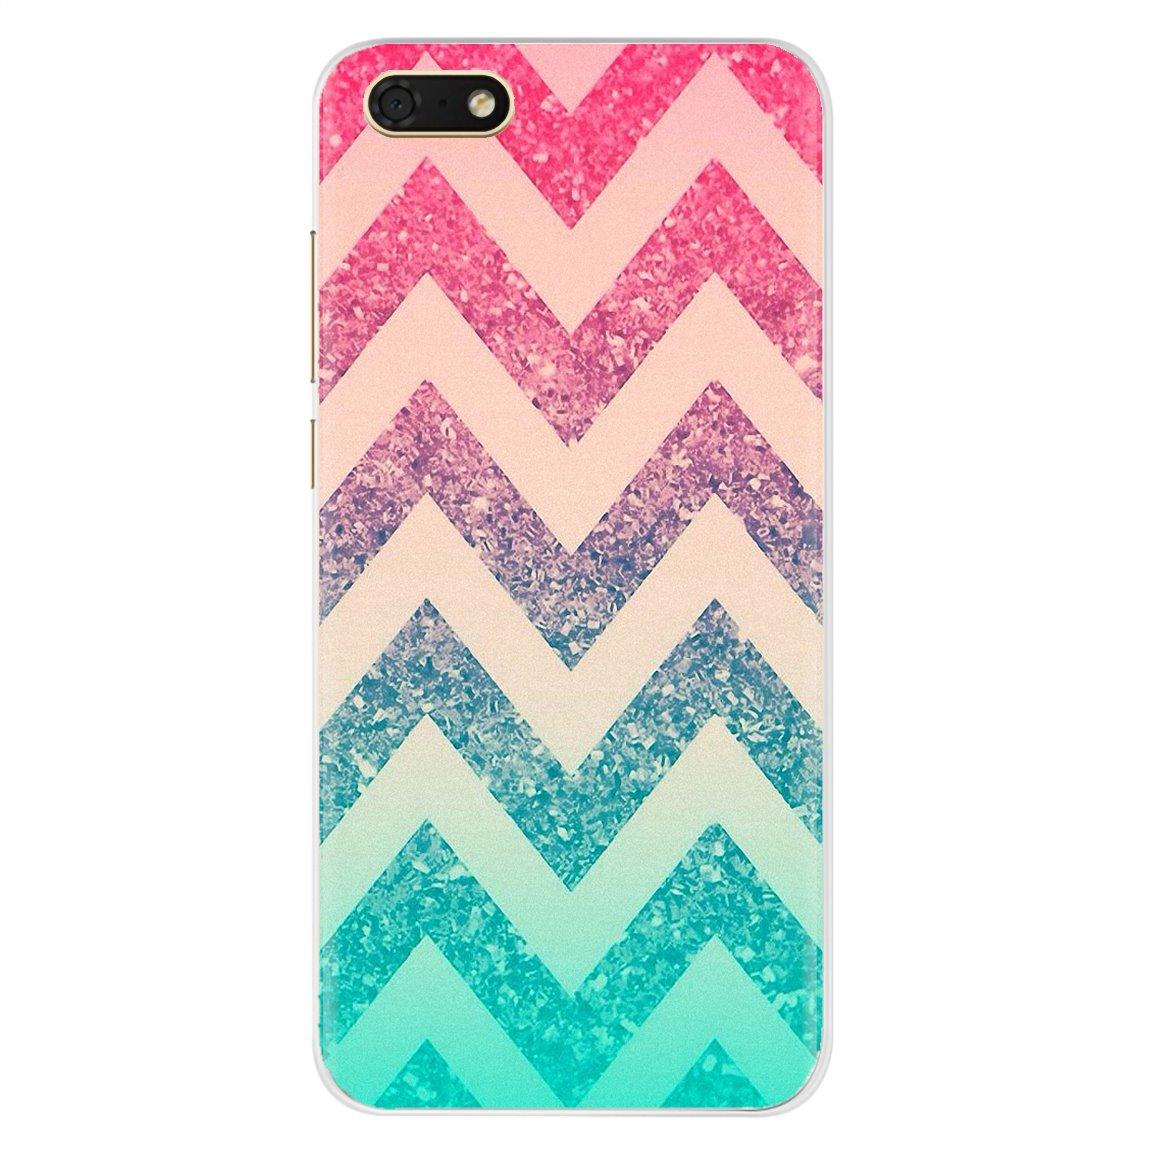 Pretty Silicone Phone Case For Motorola Moto G G2 G3 X4 E4 E5 G5 G5S G6 Z Z2 Z3 C Play Plus Colorful Color Waves Stripe Pattern